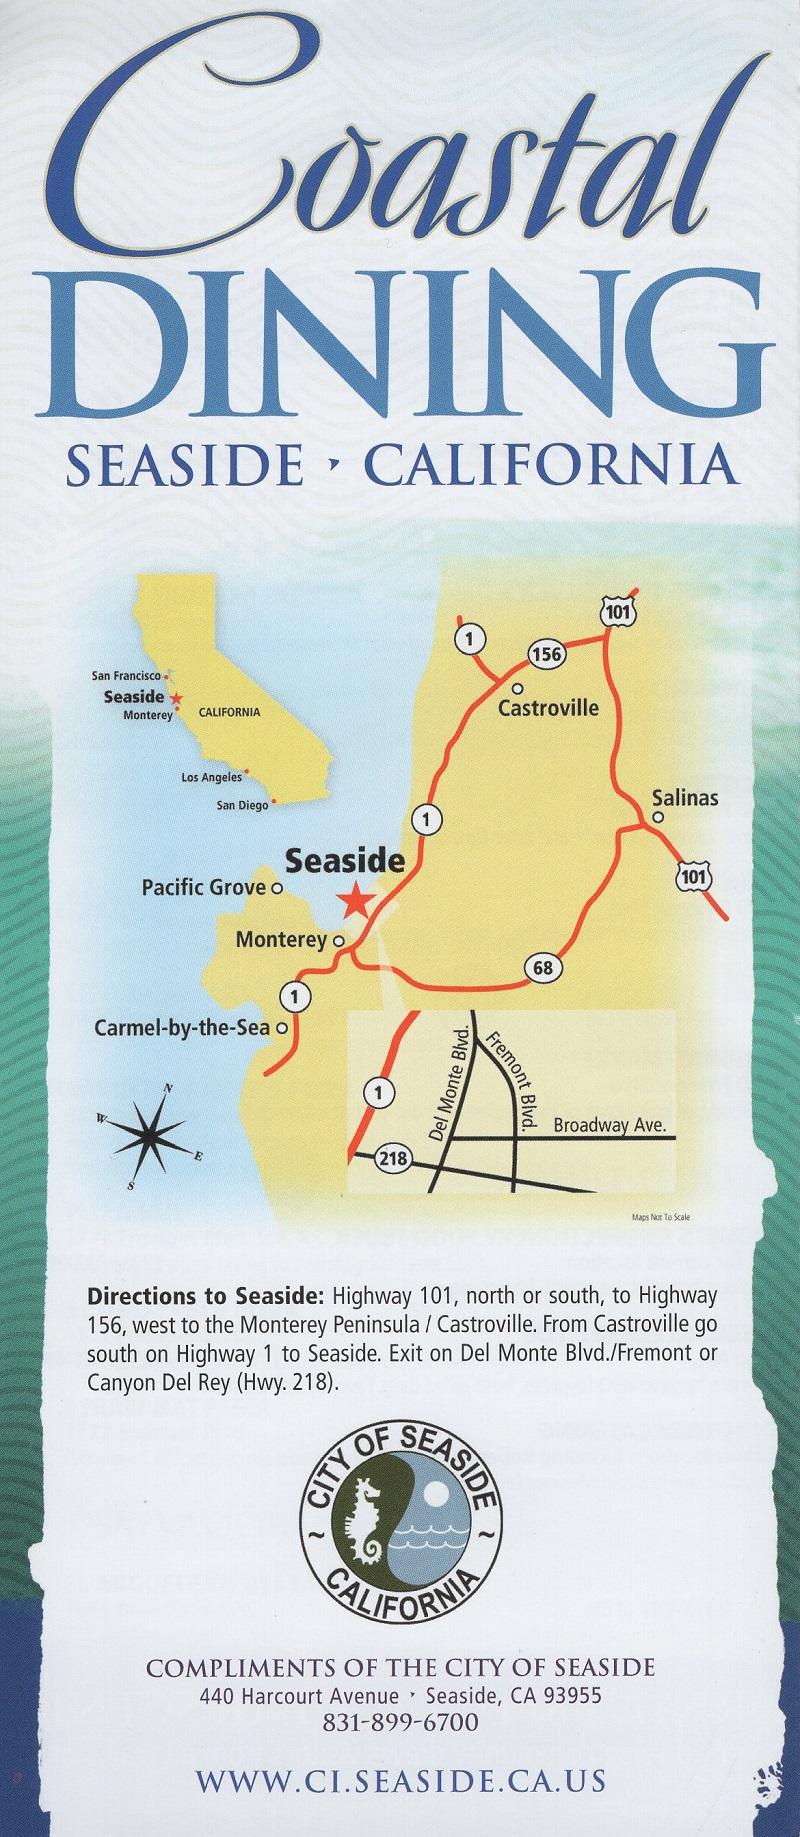 Seaside Dining Guide brochure thumbnail